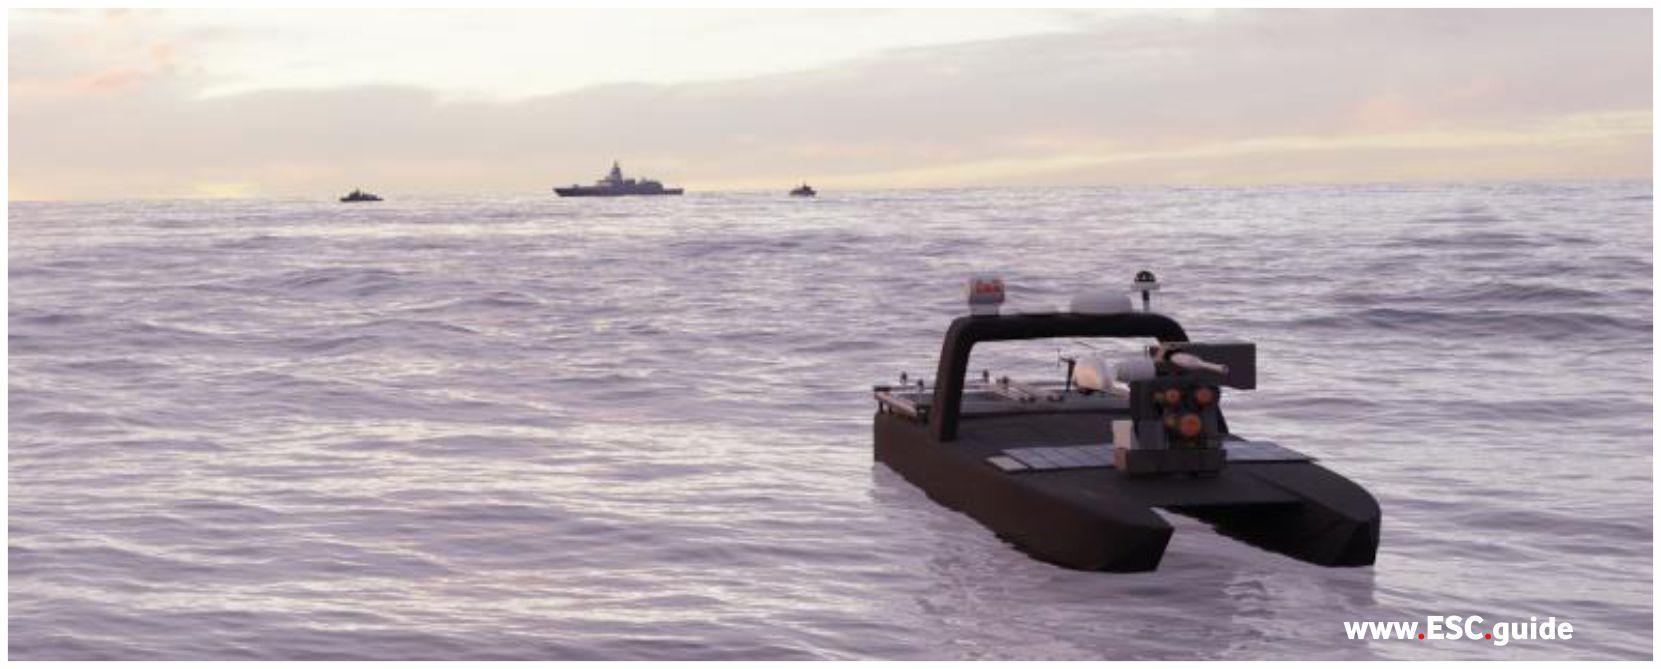 MANTAS T38 in advance of fleet performing situational awareness.